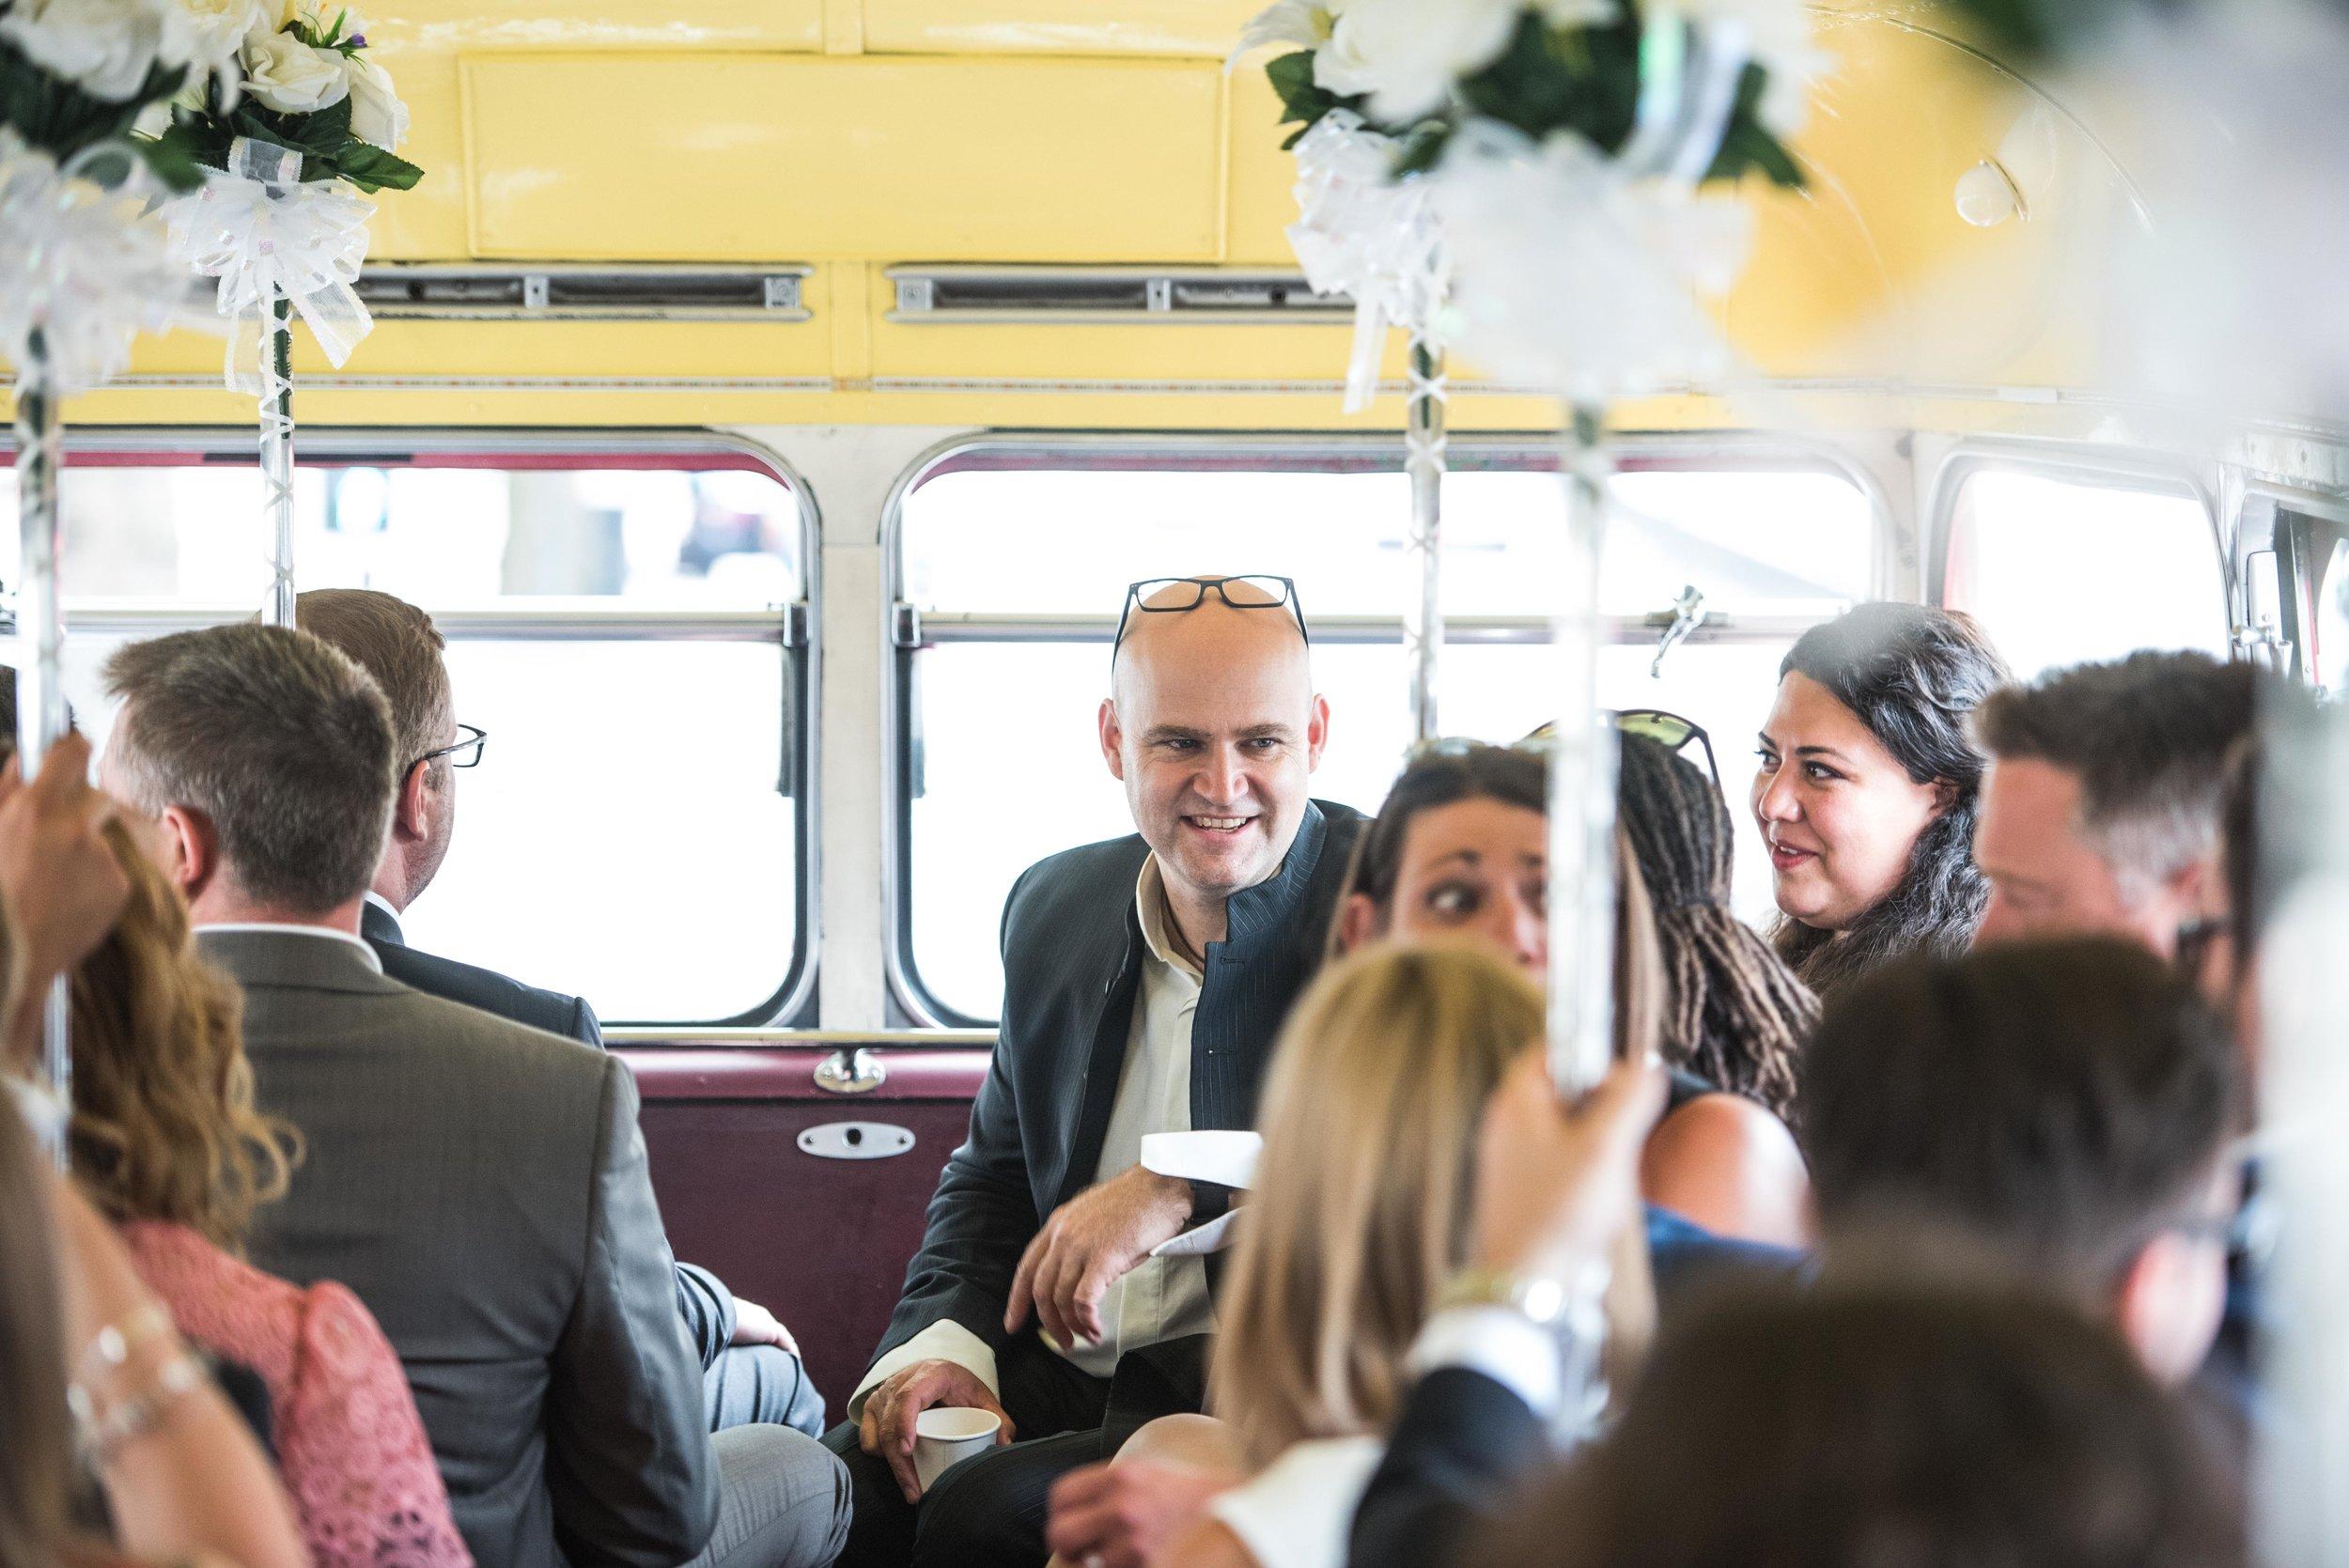 D&M_Marylebone Town Hall Wedding (172 of 239).jpg